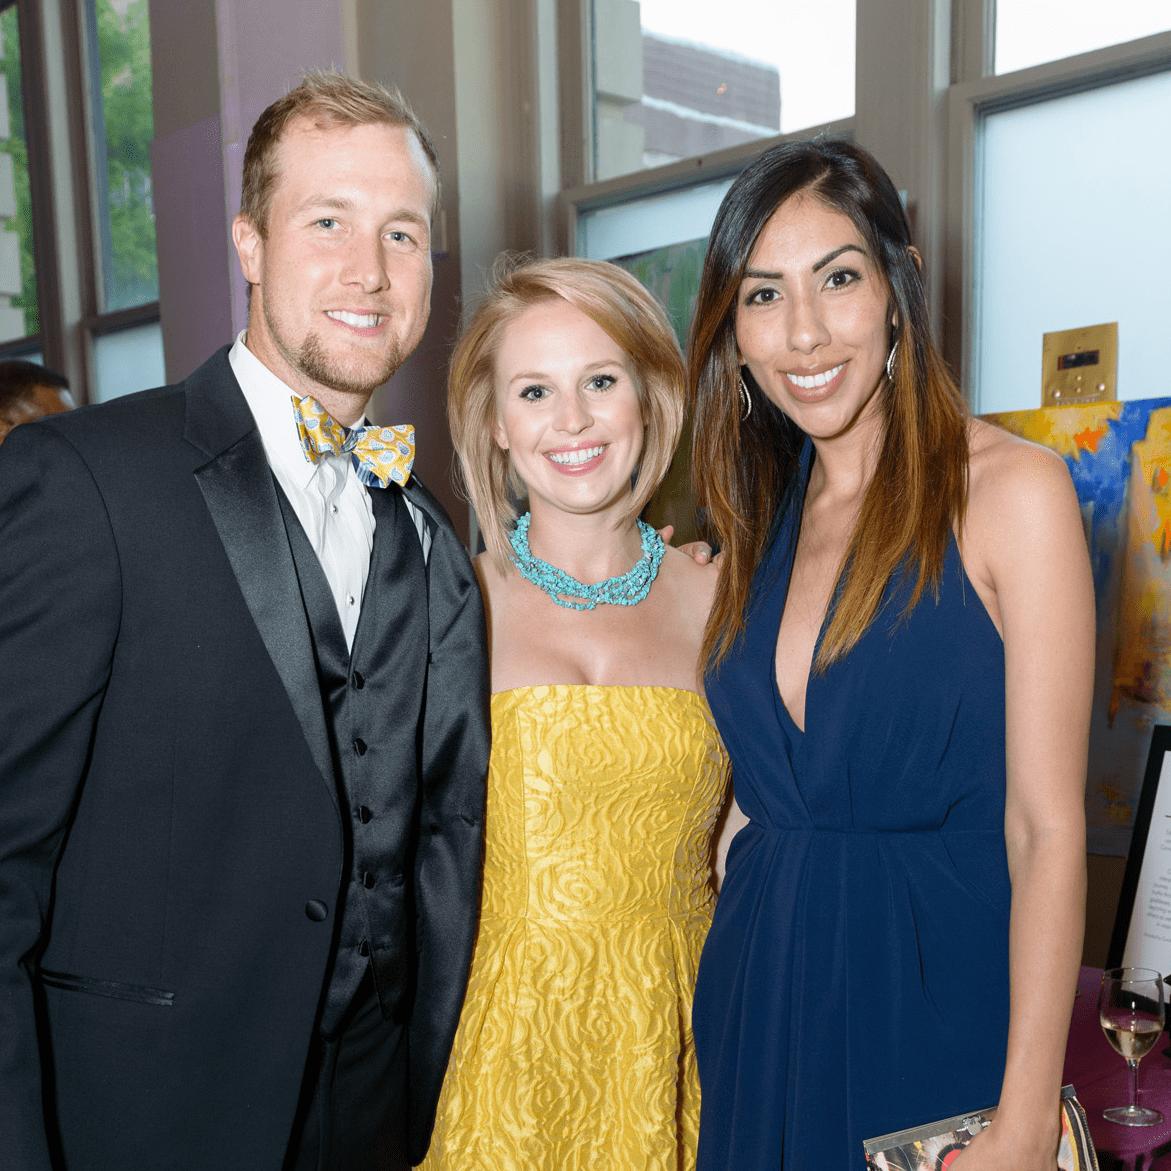 SPA, Gala April 2016, Cahal Mowery, Mallory Cheatham and Marcela Maxson